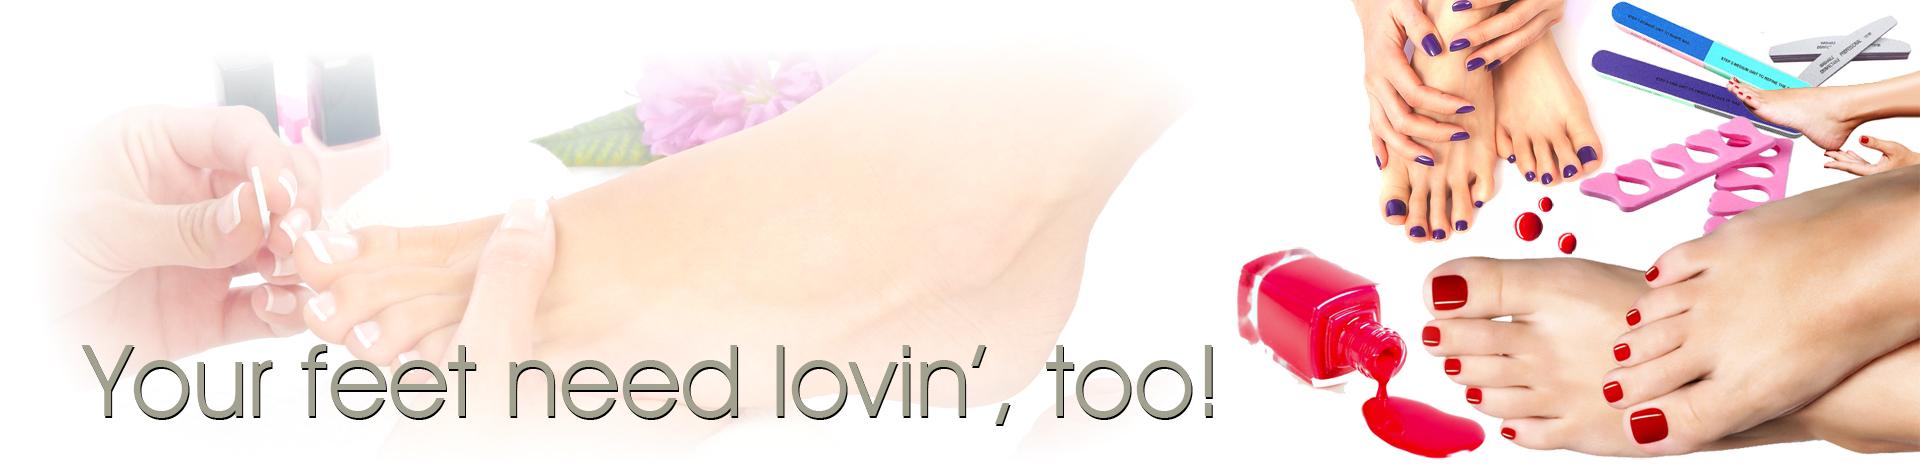 FootSpa_01